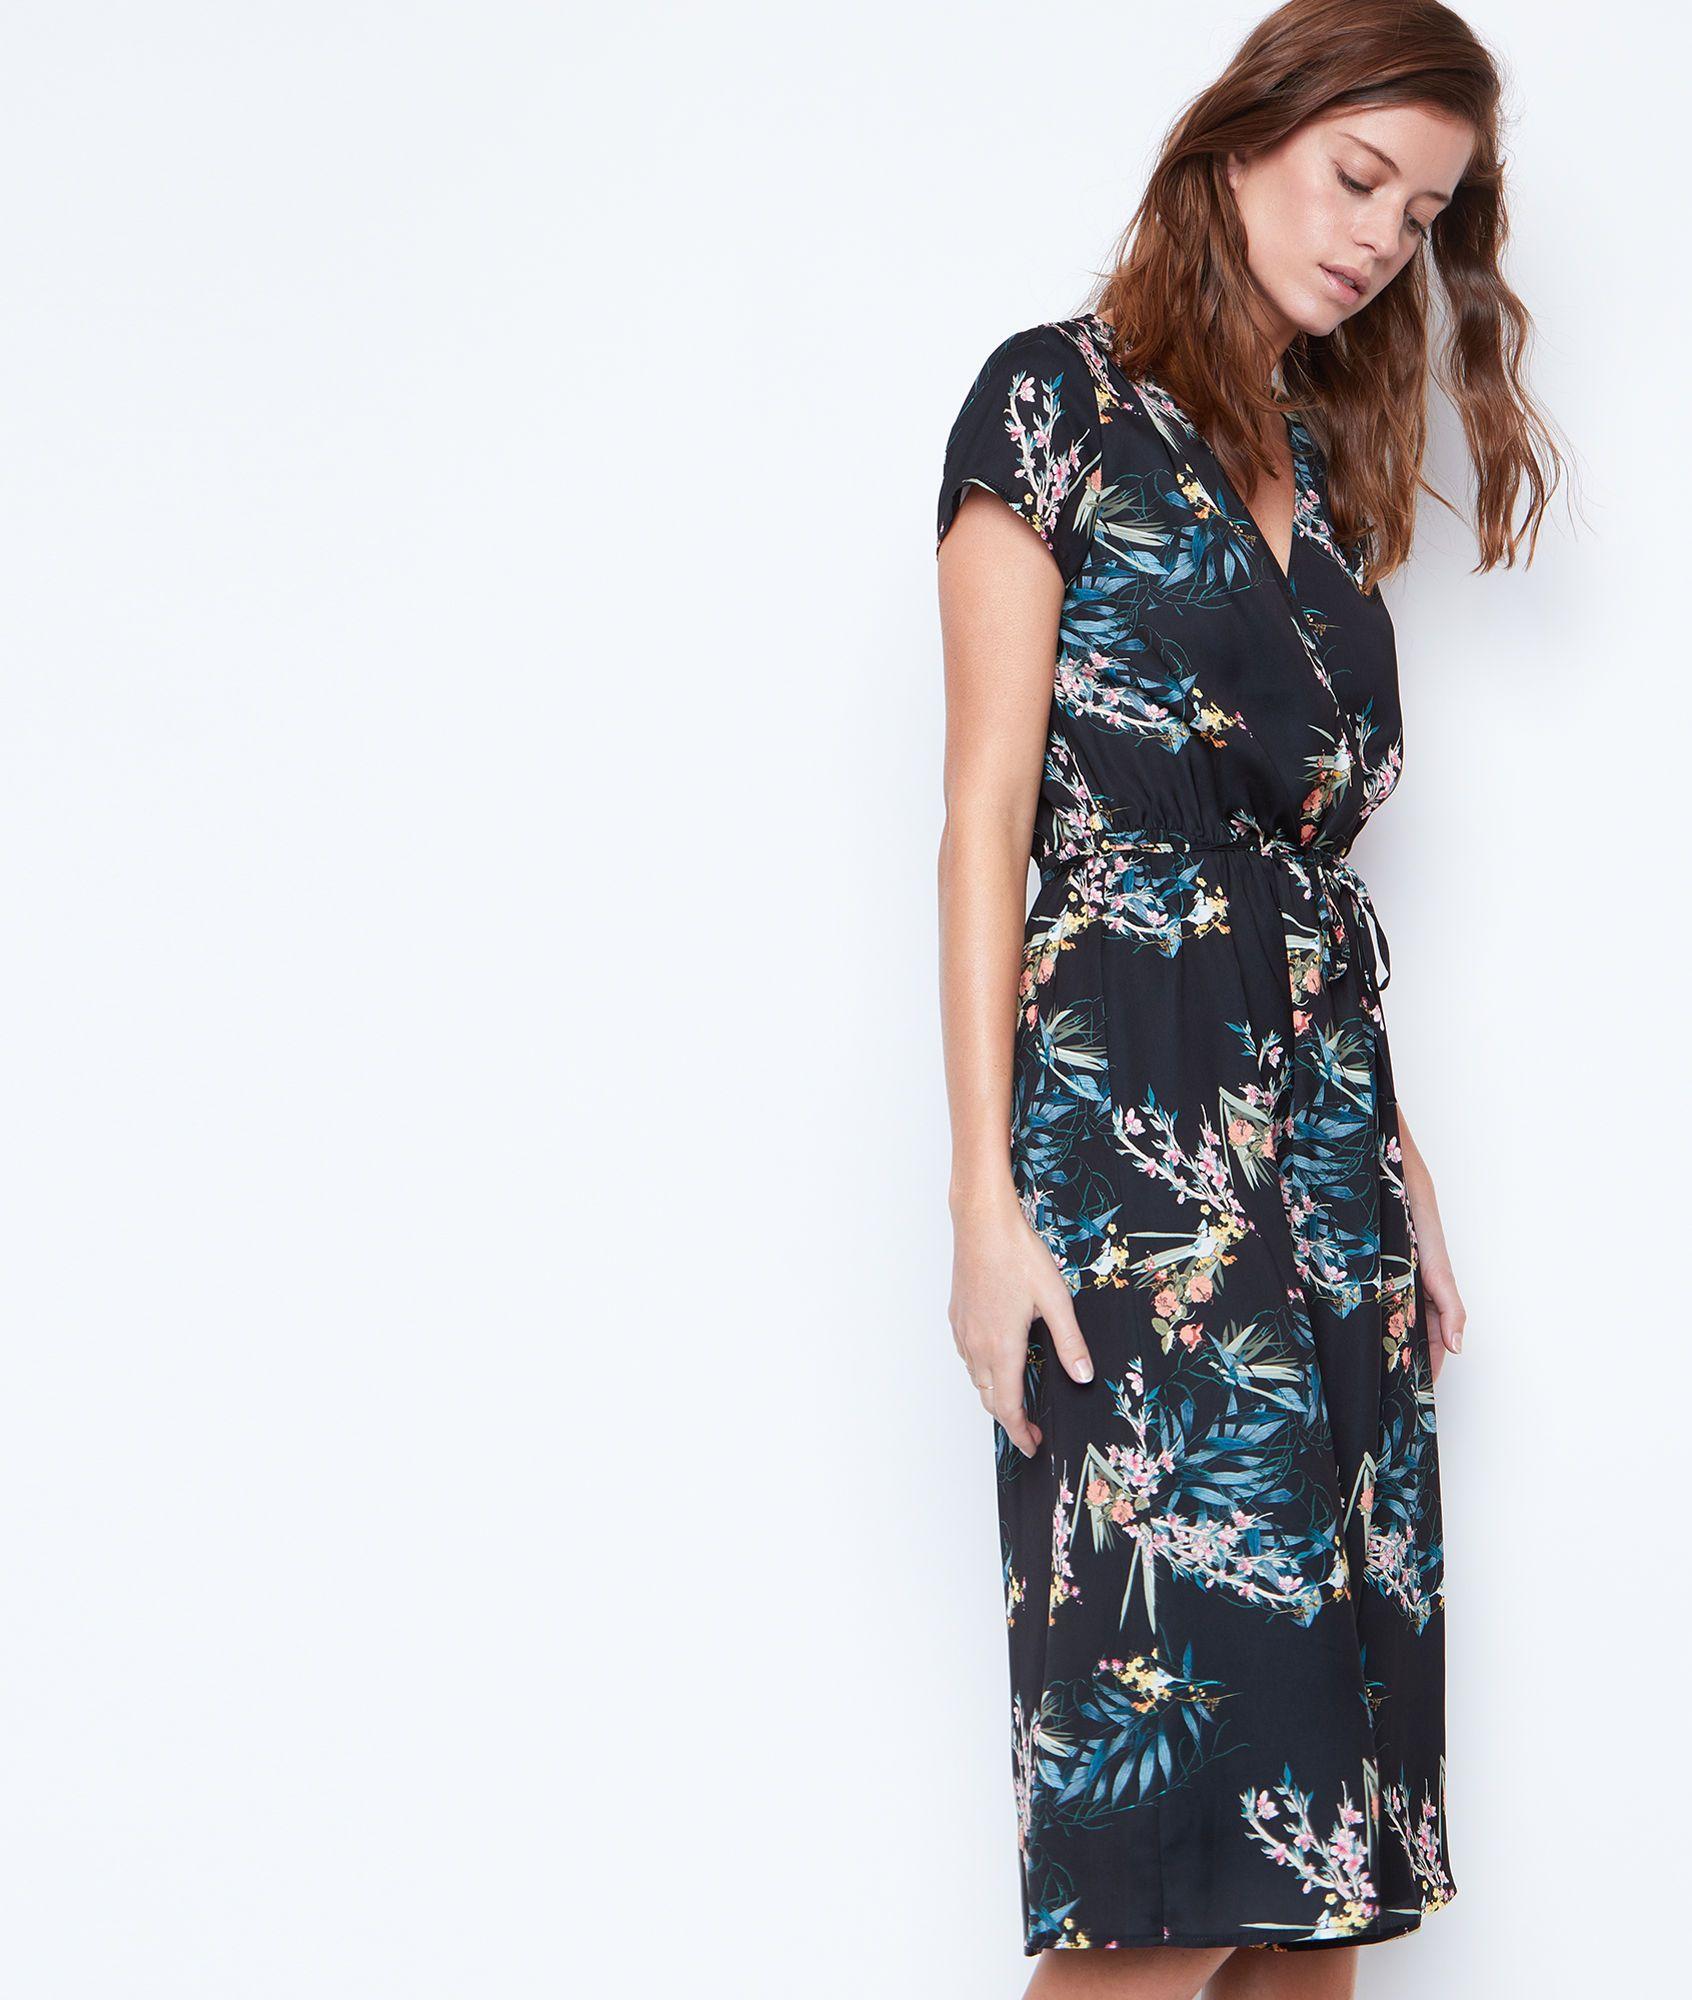 Robe Mi Longue Imprimee Zelia Noir Etam Robe Mi Longue Pret A Porter Robe Maxi